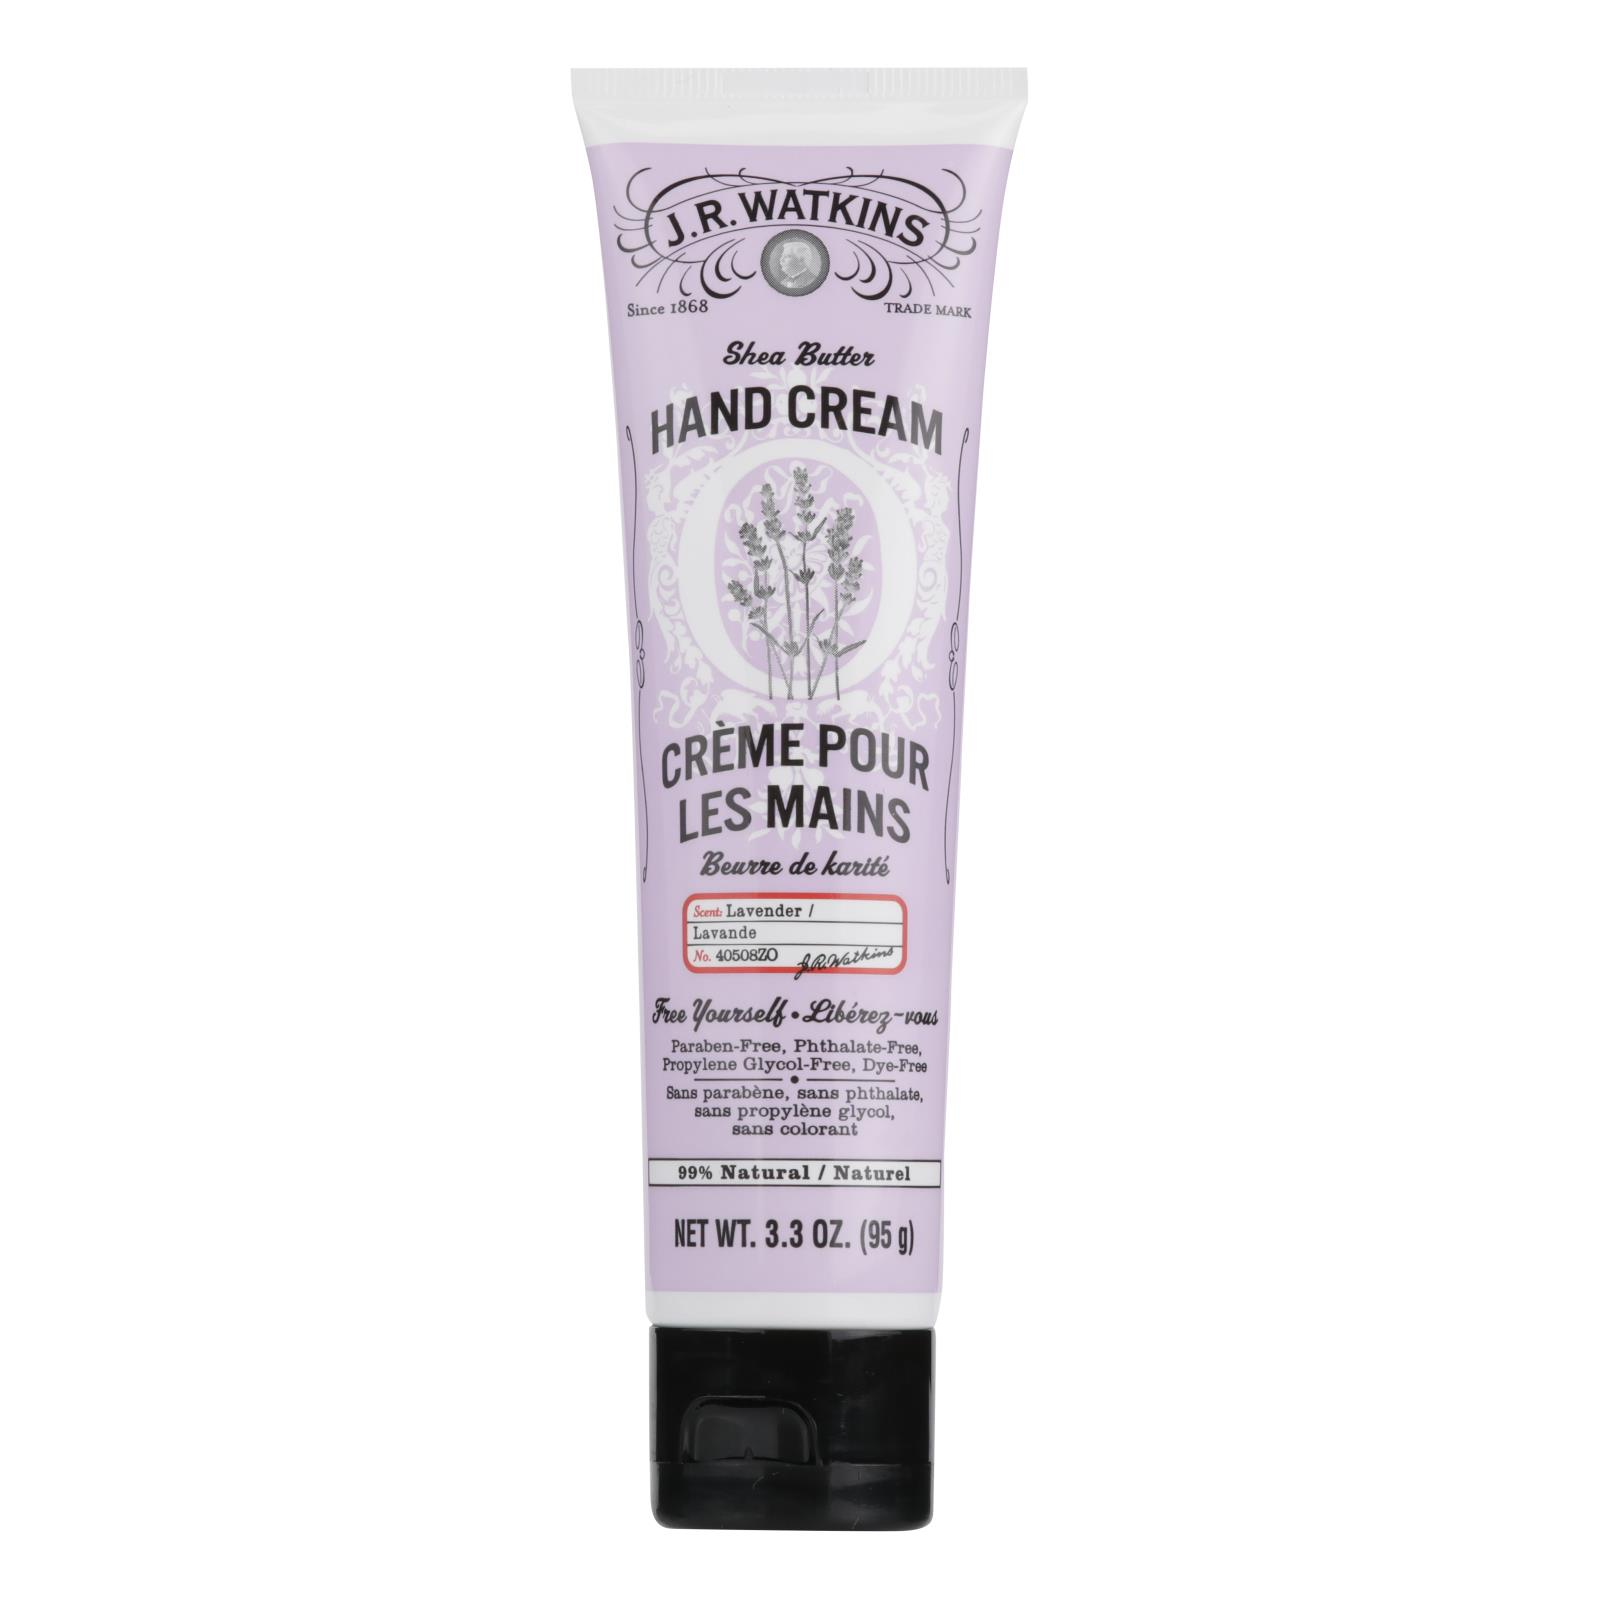 J.R. Watkins Body Cream Lavender - 3.3 oz